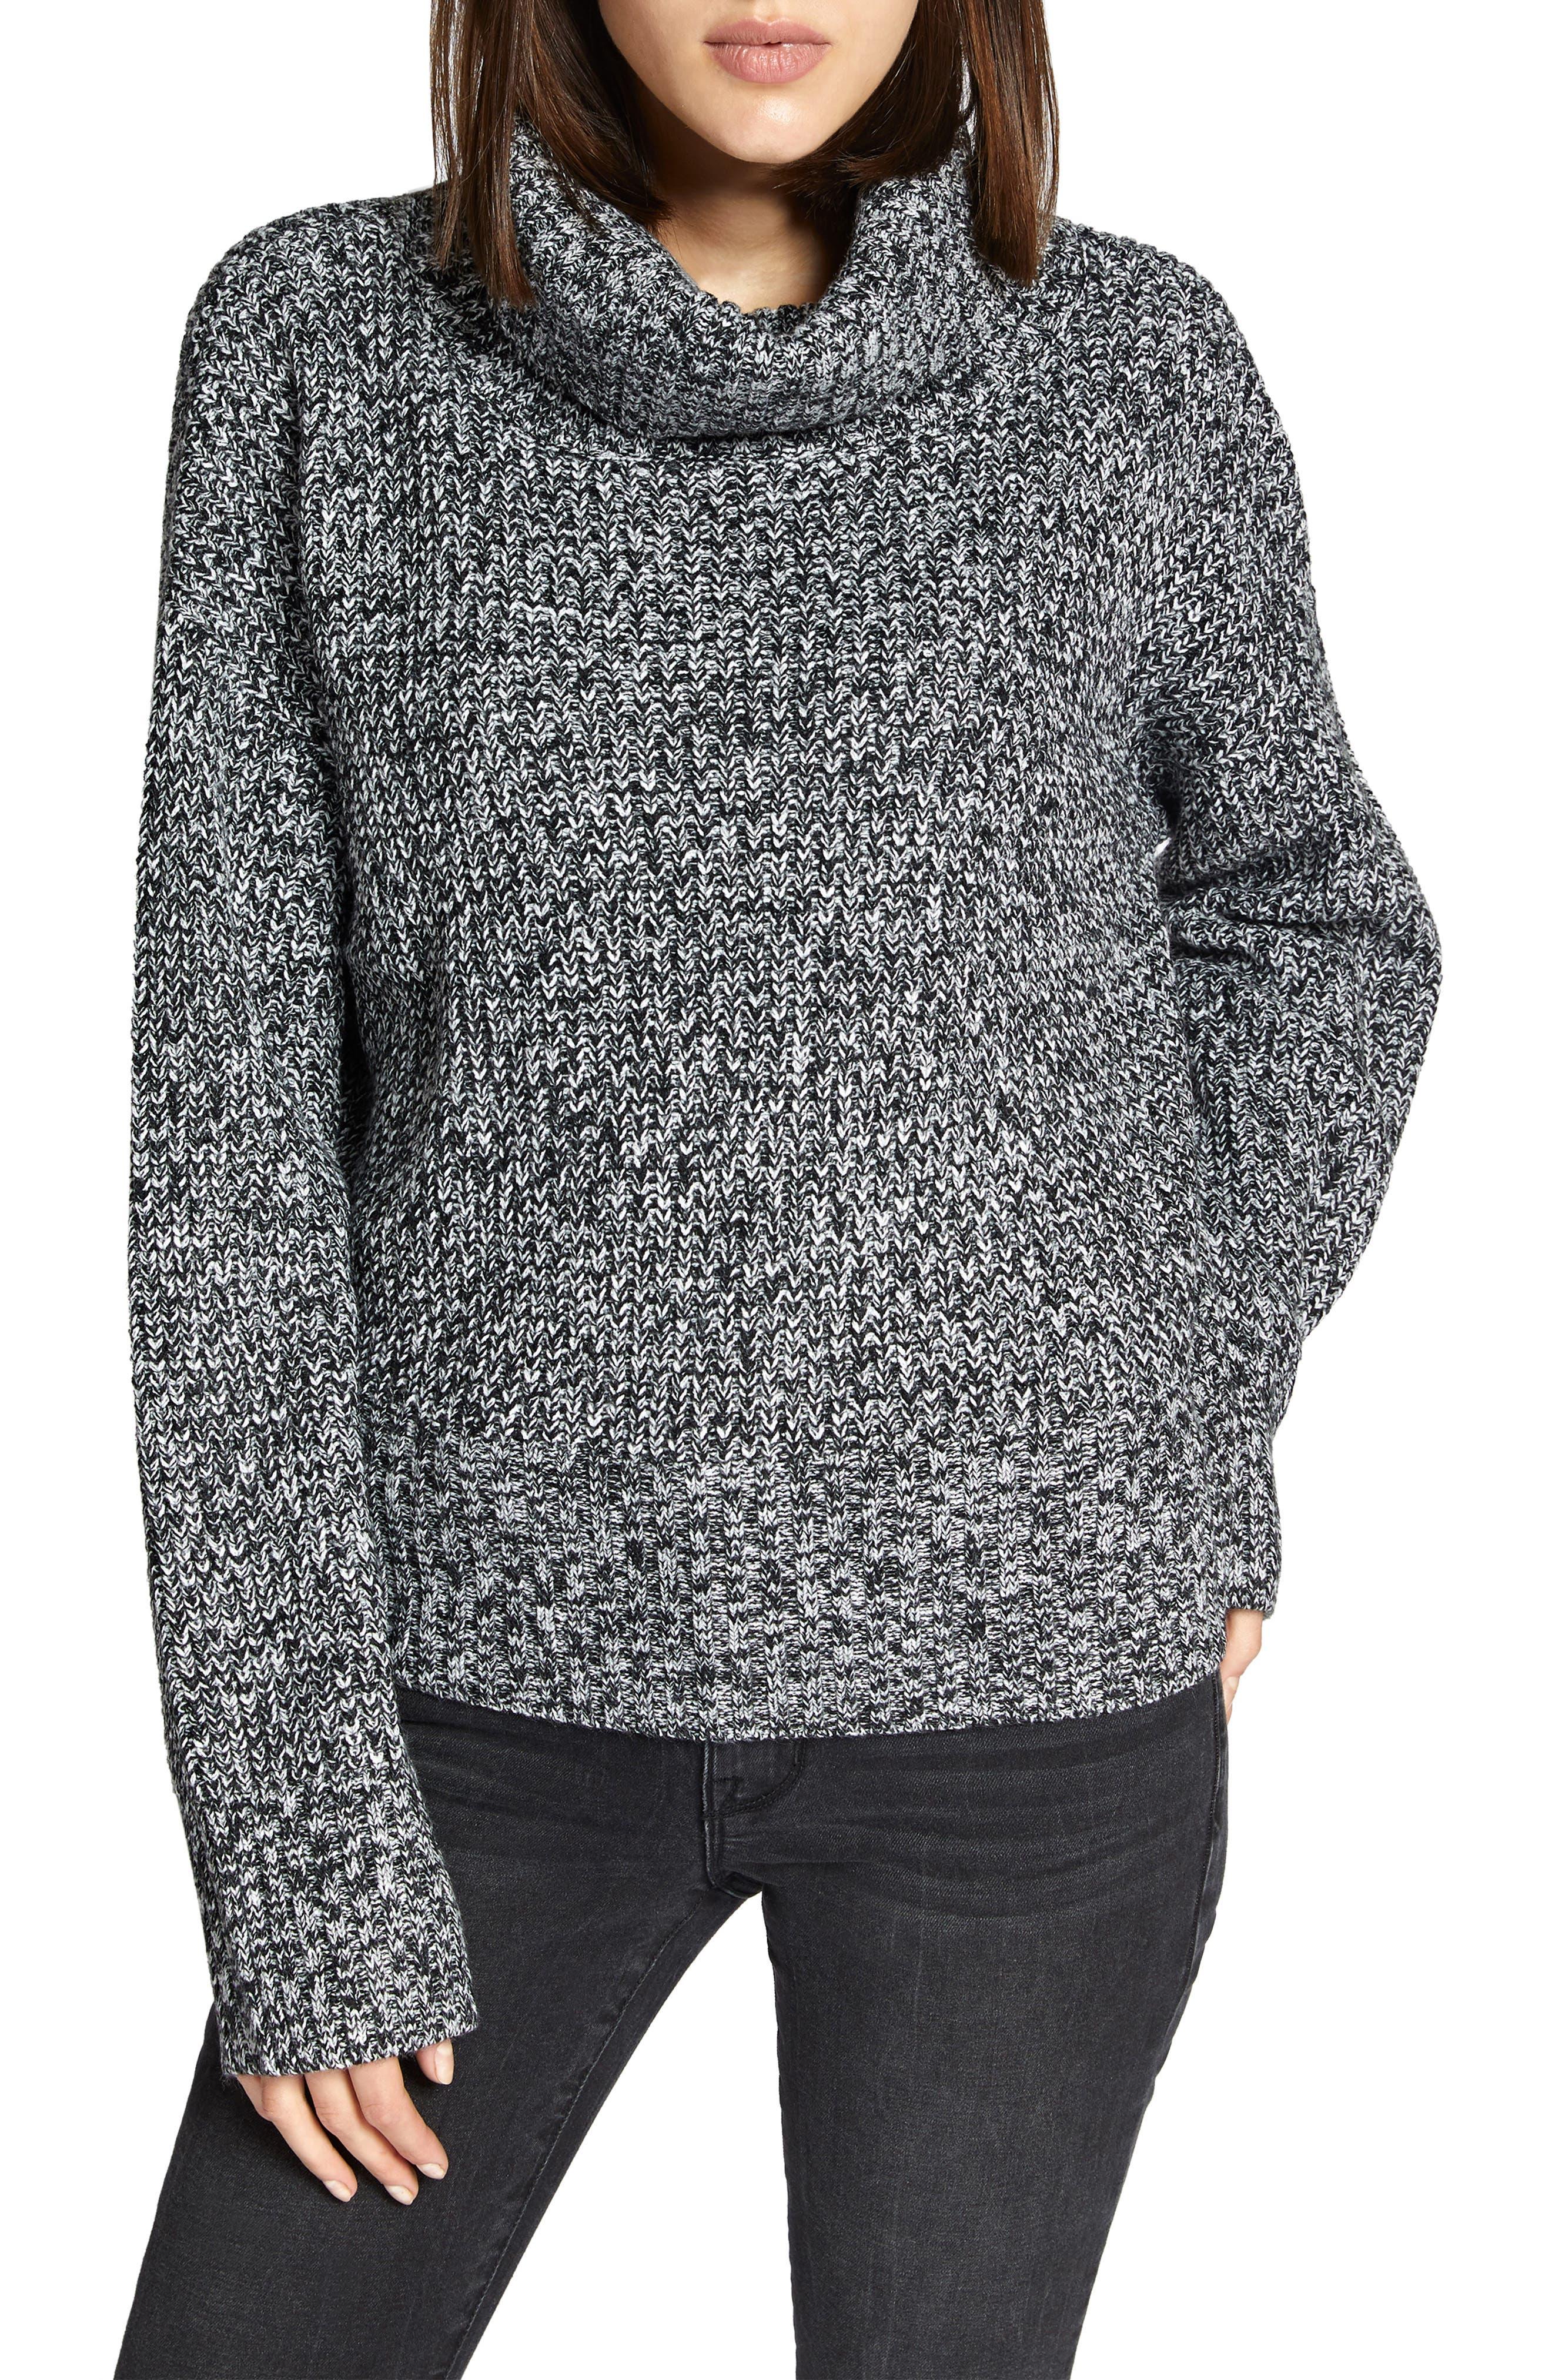 Cowl Neck Shaker Sweater,                             Main thumbnail 1, color,                             BLACK/ WINTER